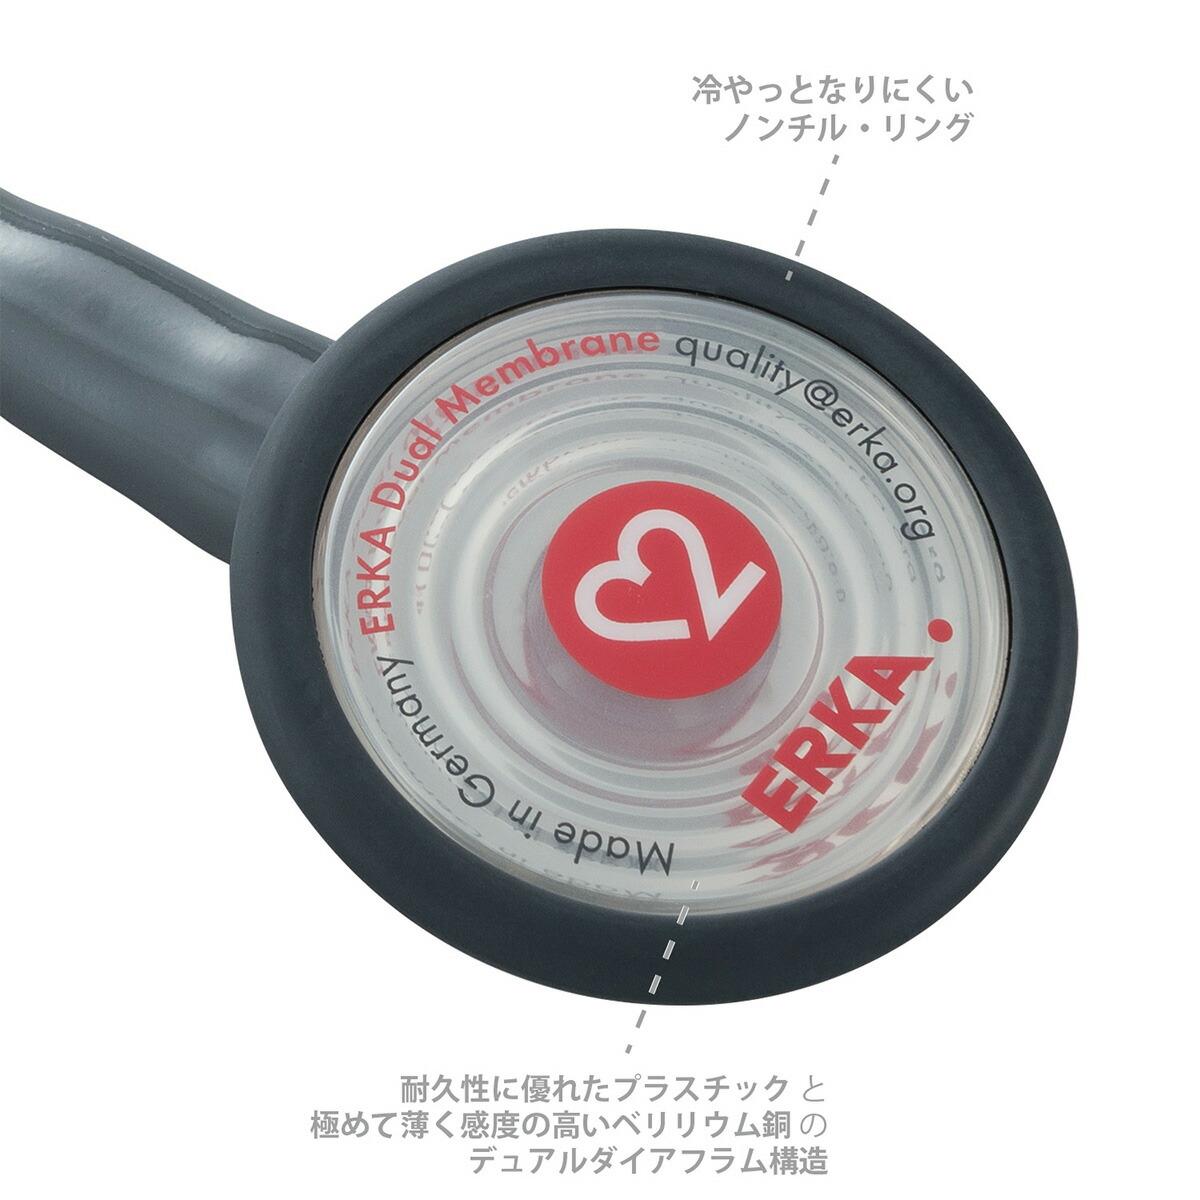 ERKA.フィネス ライト:520 ダイアフラム面(46mm)